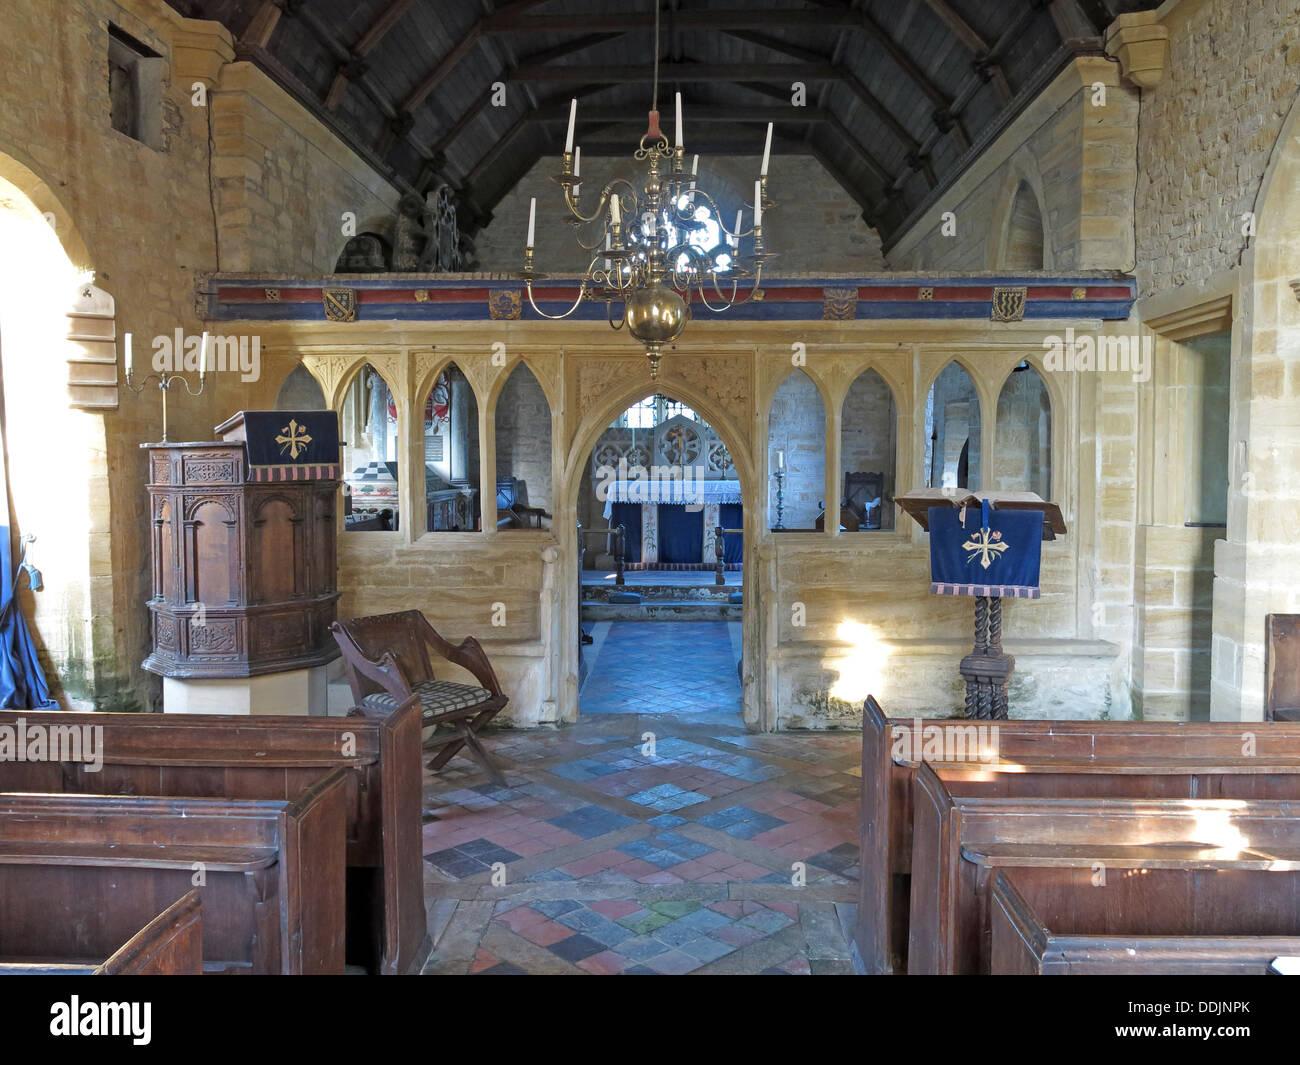 Chapel at Brympton d'Evercy, Yeovil, Somerset, England, UK - Stock Image